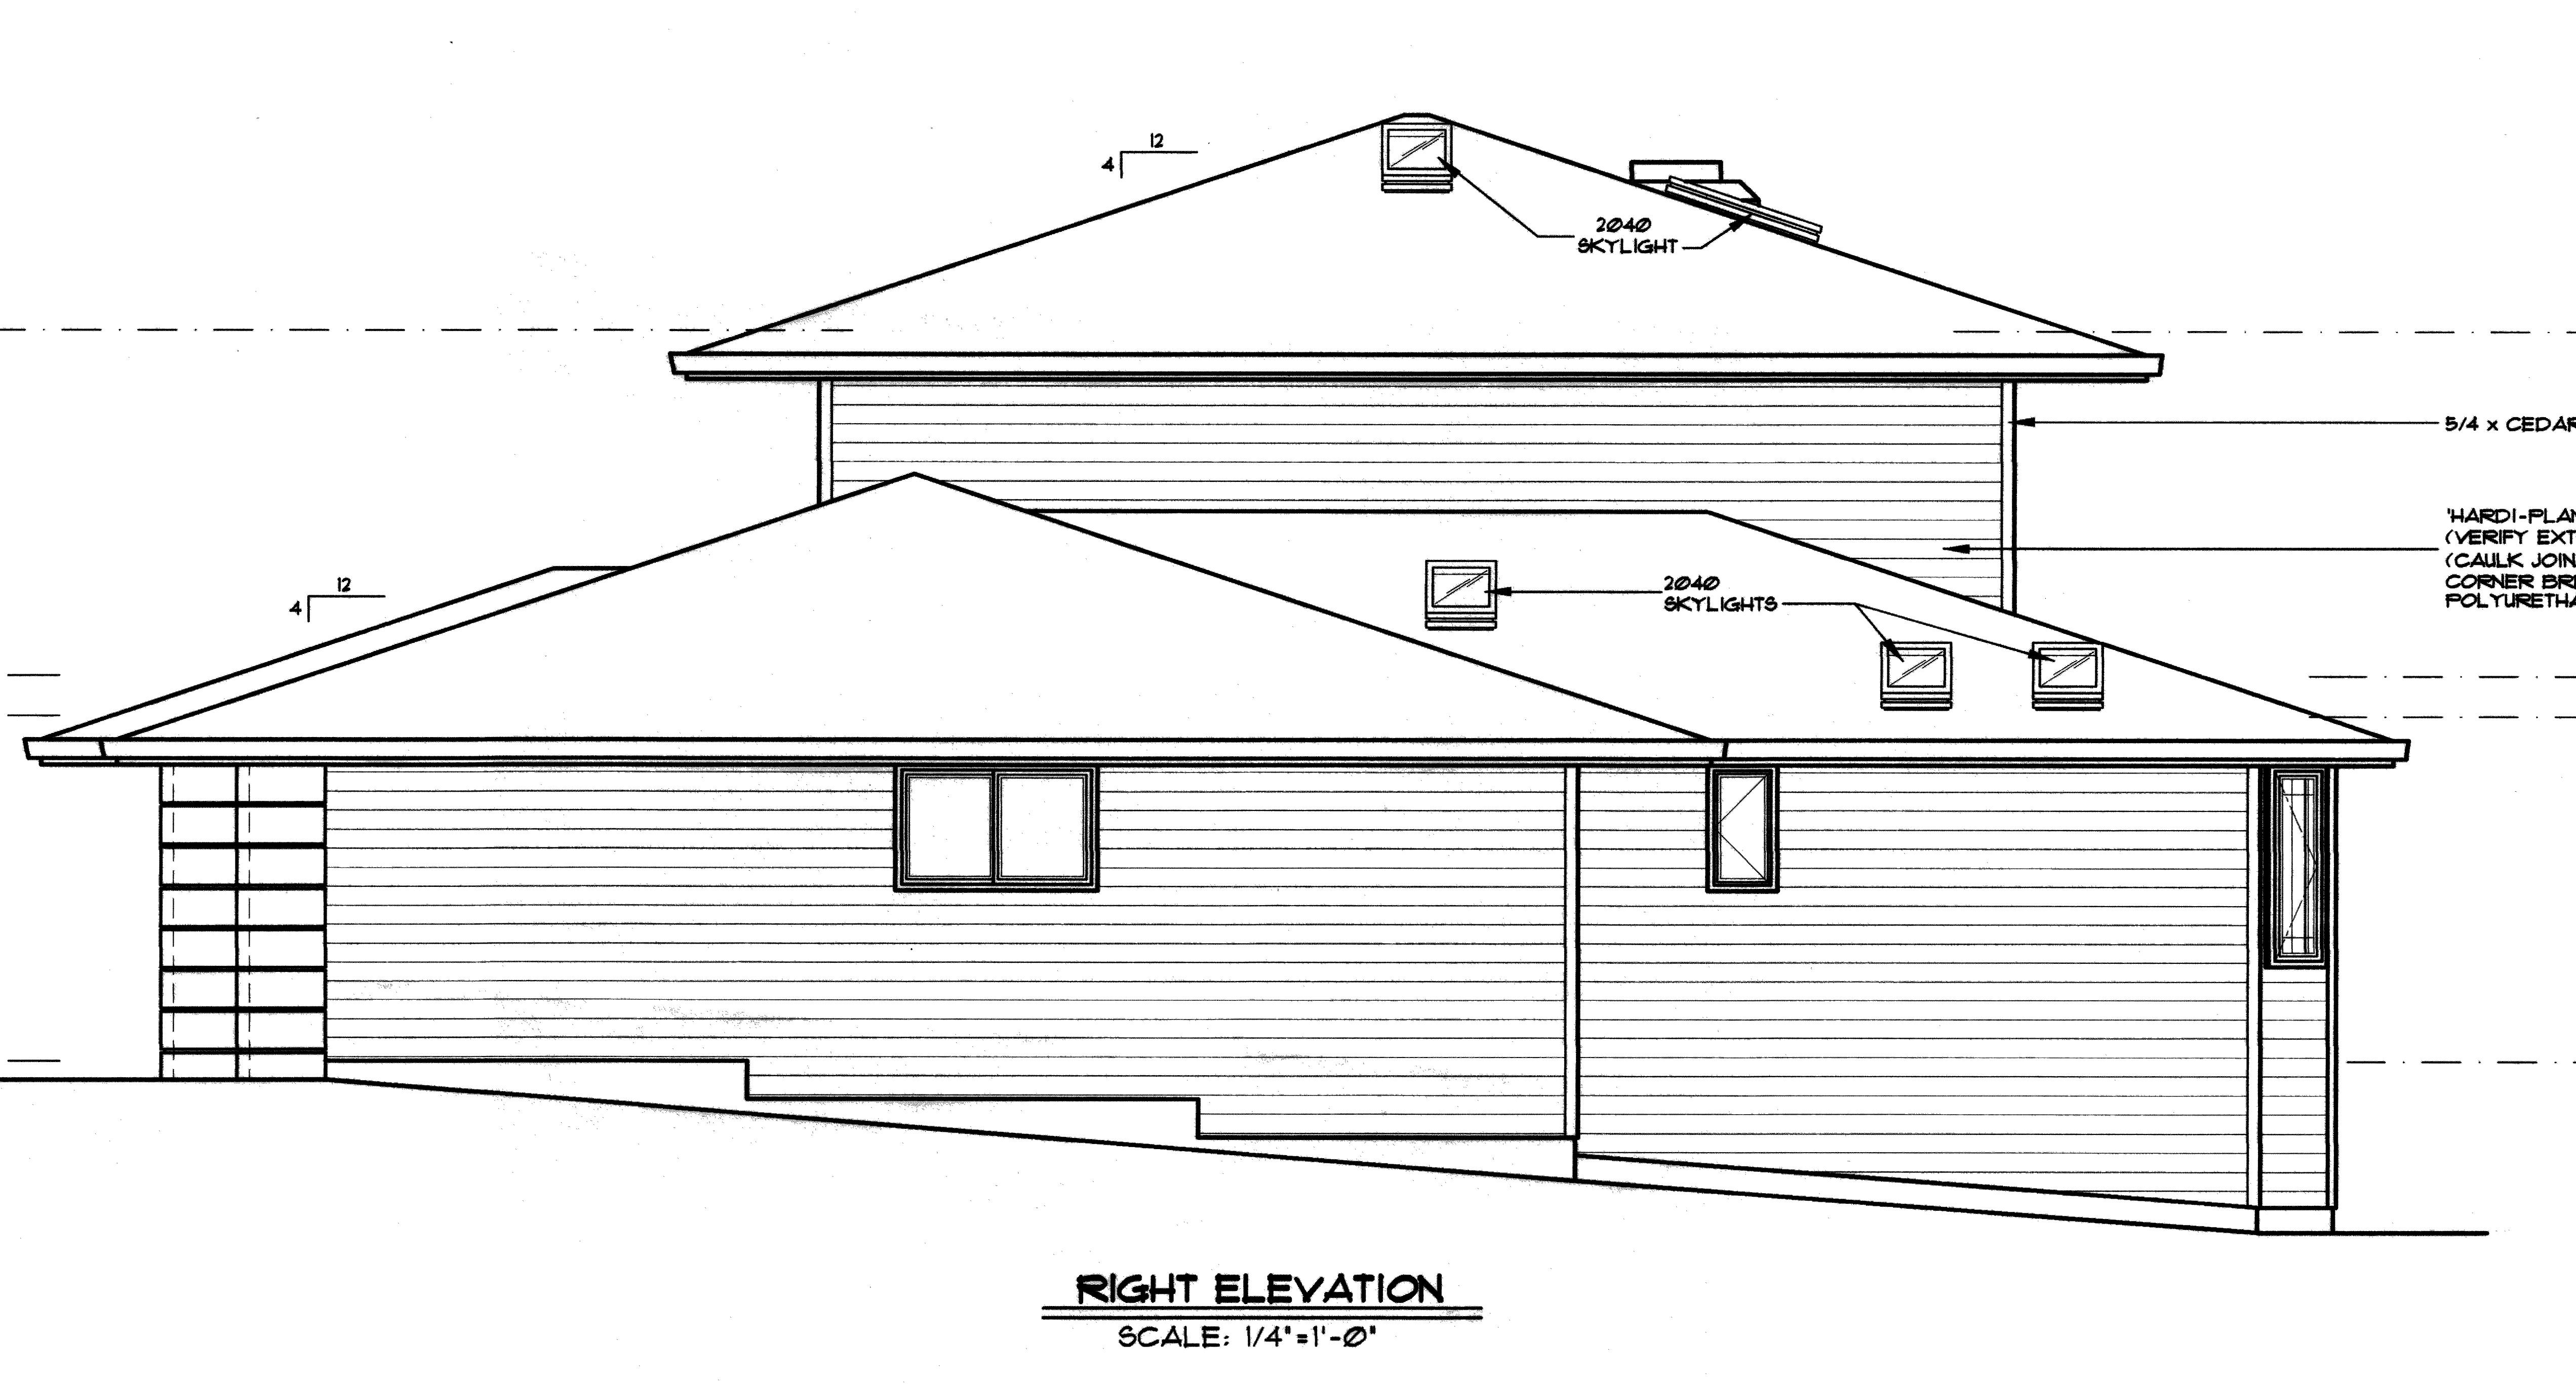 Prairie feng shui house plans home design 2393 for Feng shui house plan